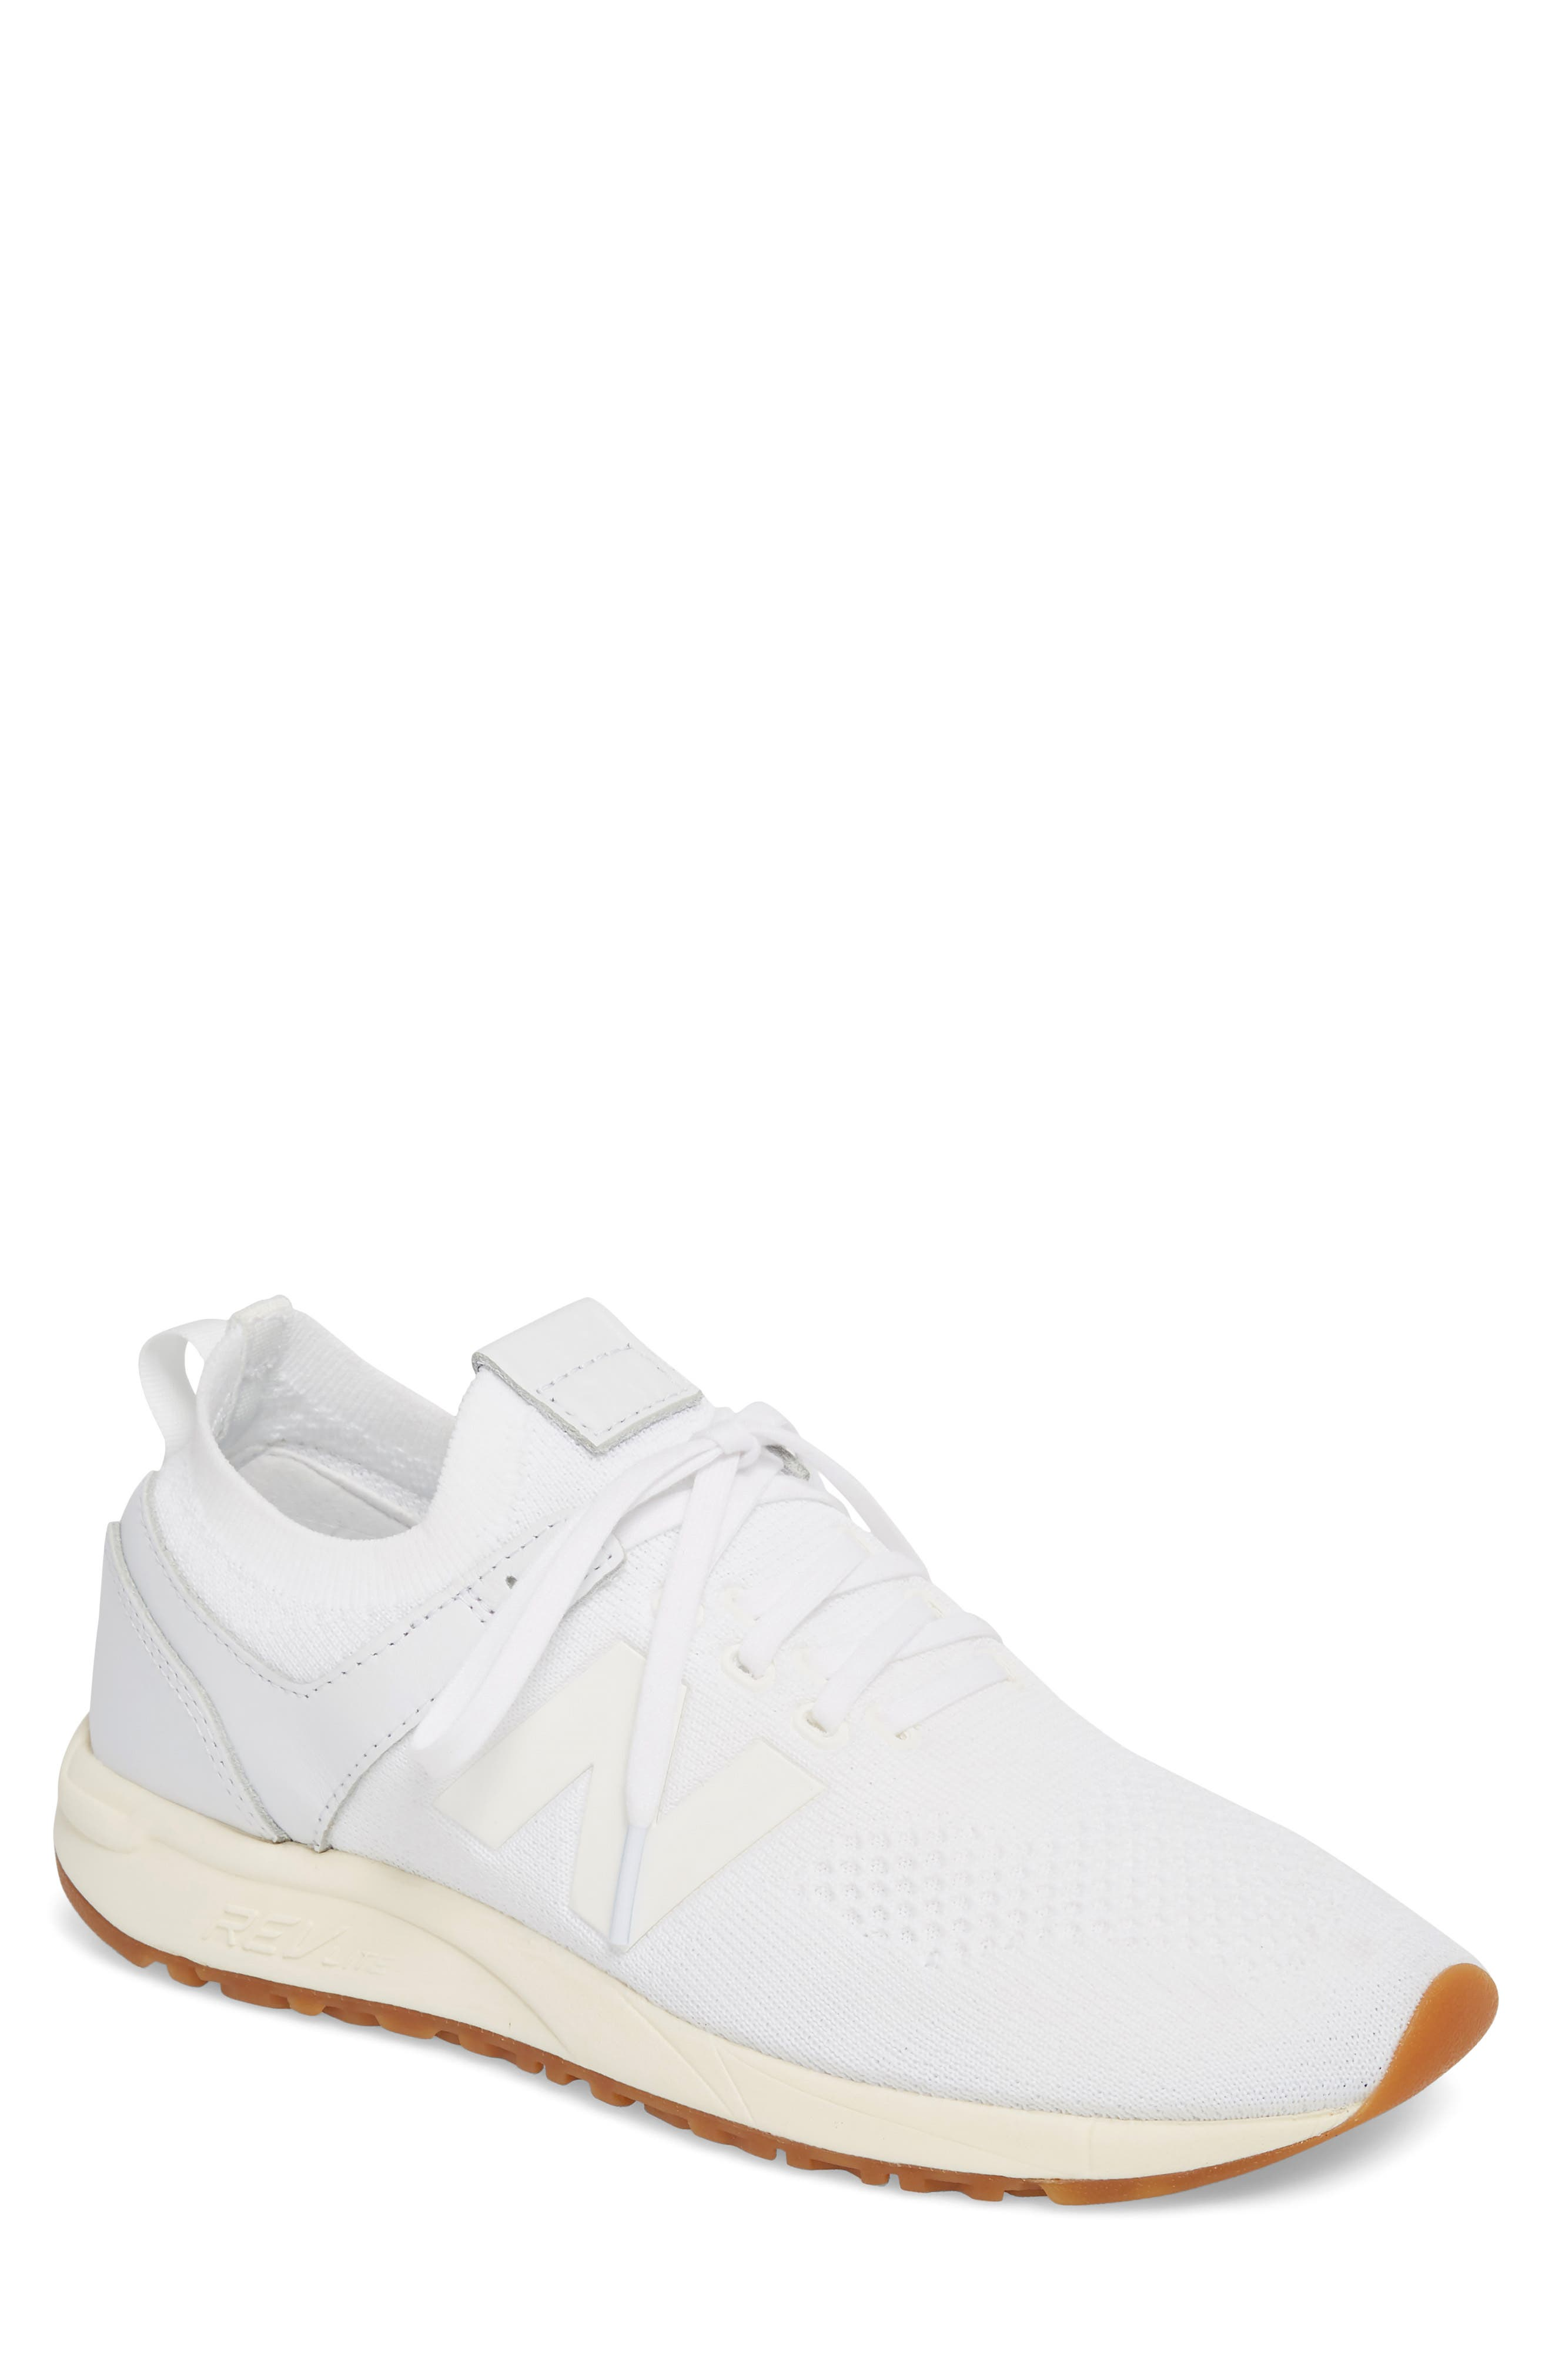 Alternate Image 1 Selected - New Balance 247 Decon Knit Sneaker (Men)